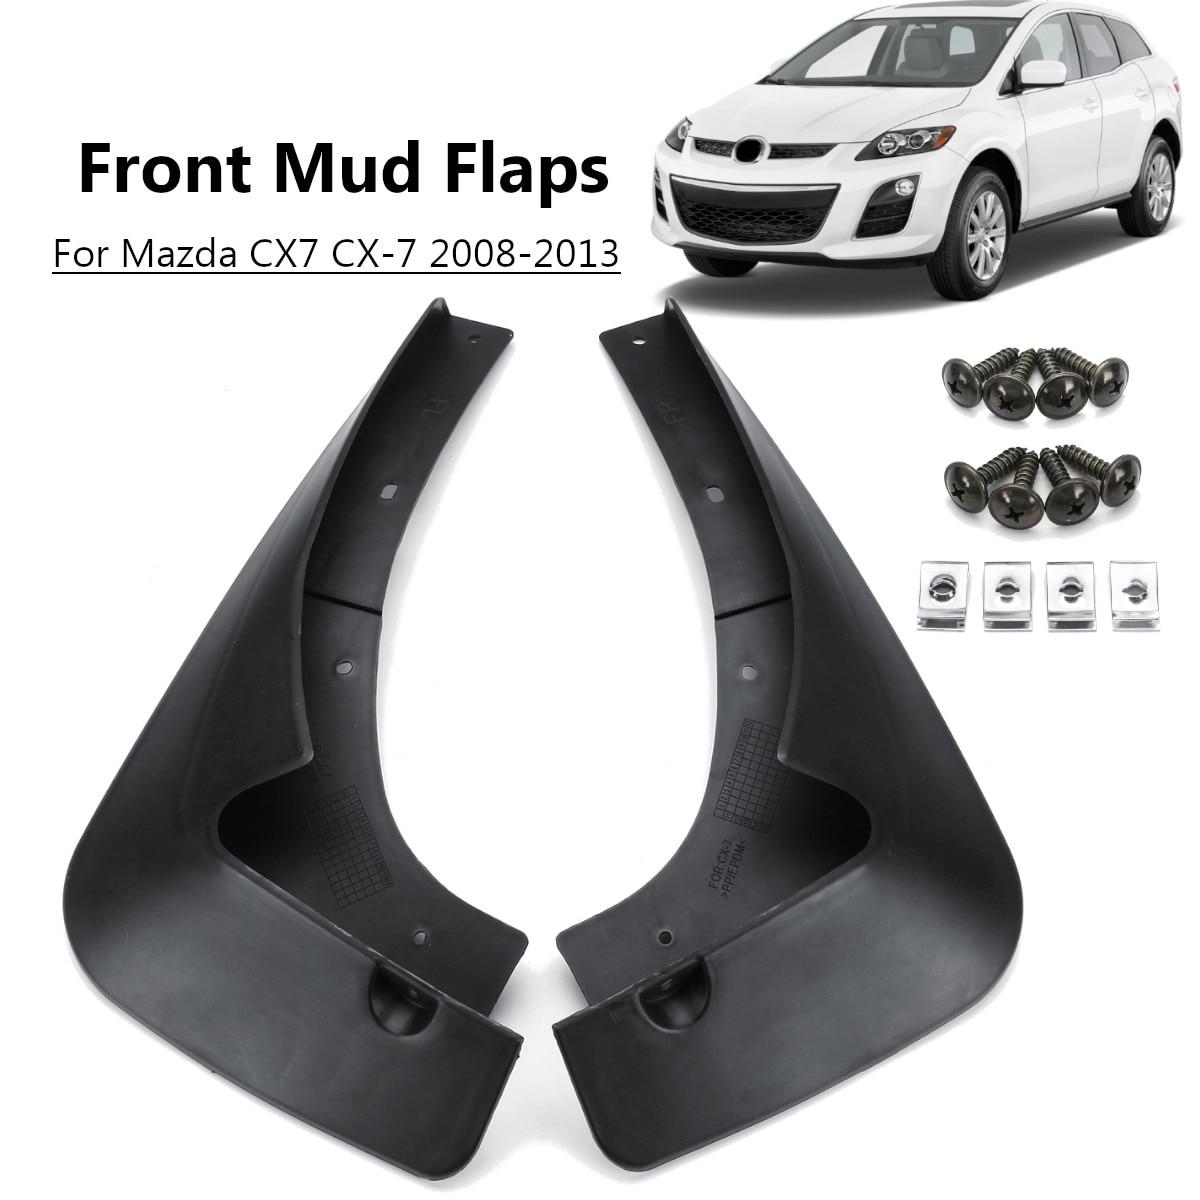 White Car Mud Flaps Mudguards Splash Guards Fenders For Honda Accord 2013-2017